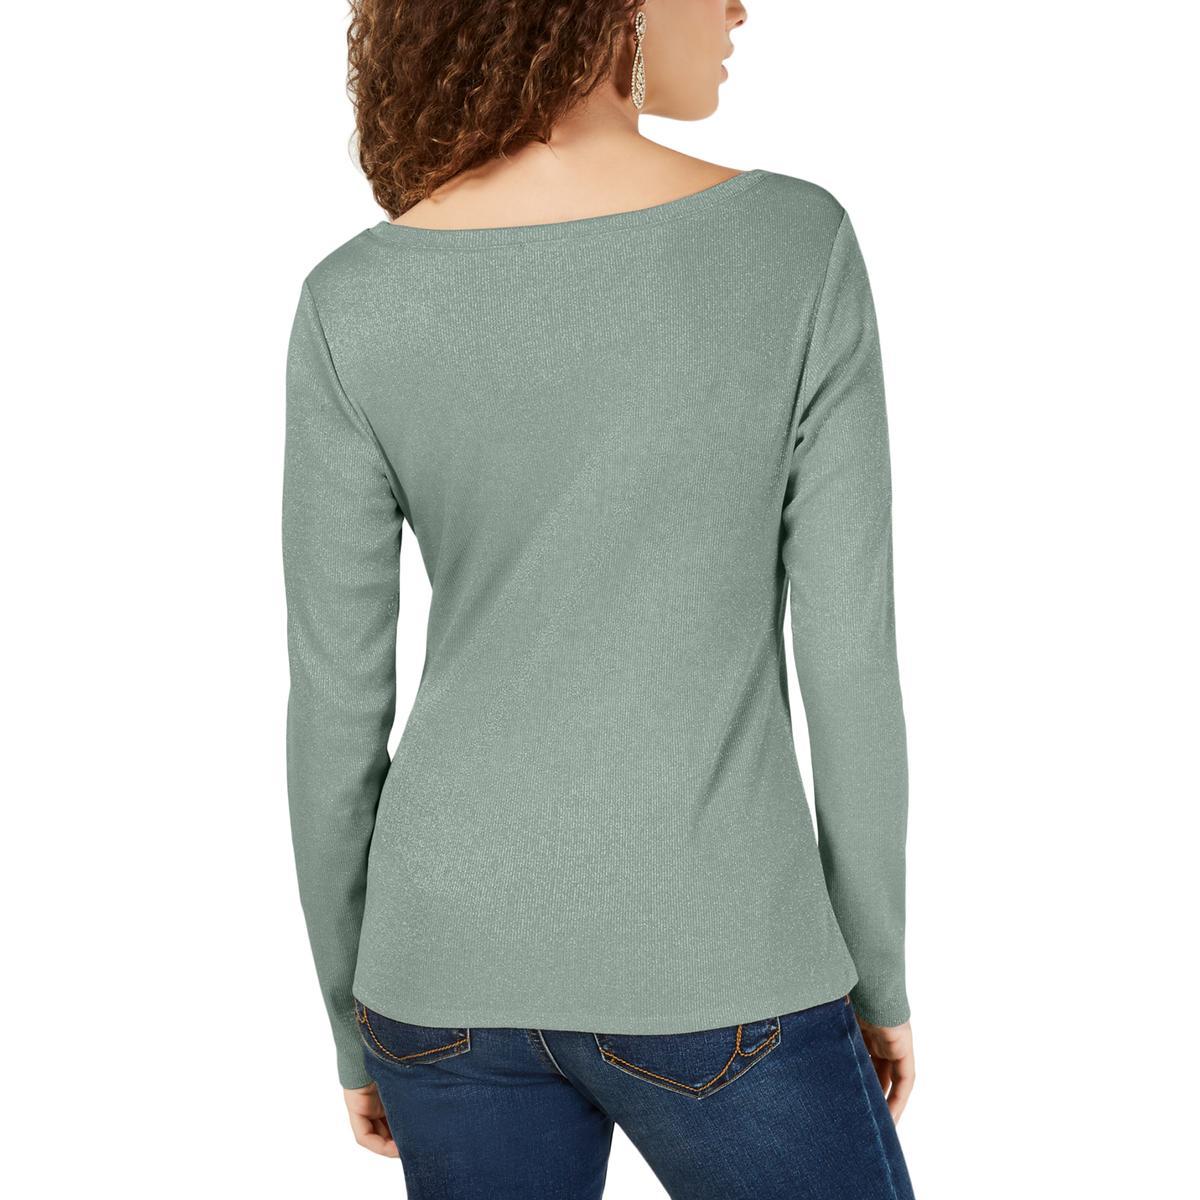 INC Womens Green Metallic Tie Front Long Sleeves Top Shirt XL BHFO 0610